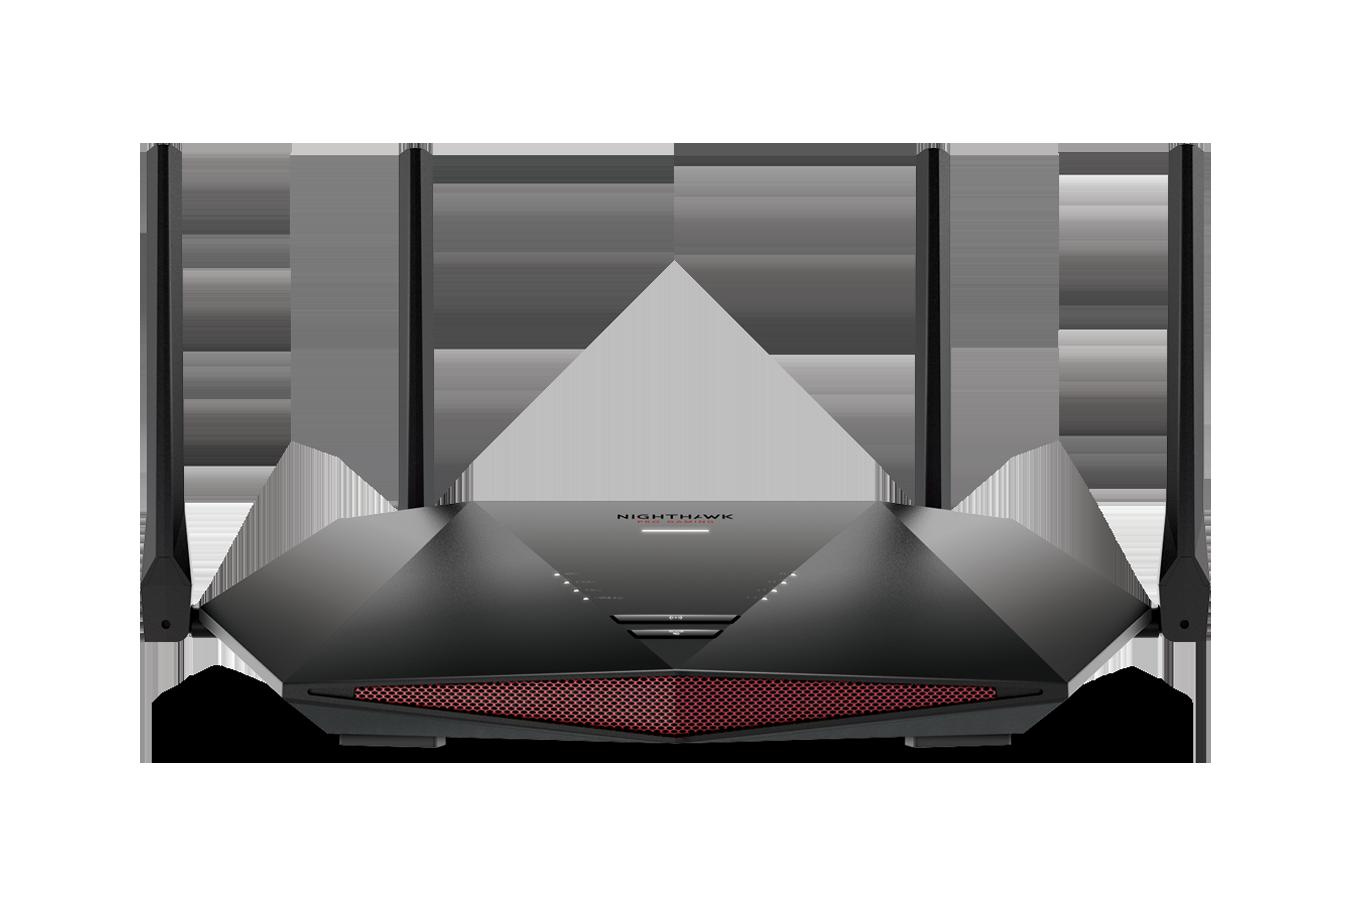 Netgear Nighthawk XR1000 gaming router setup